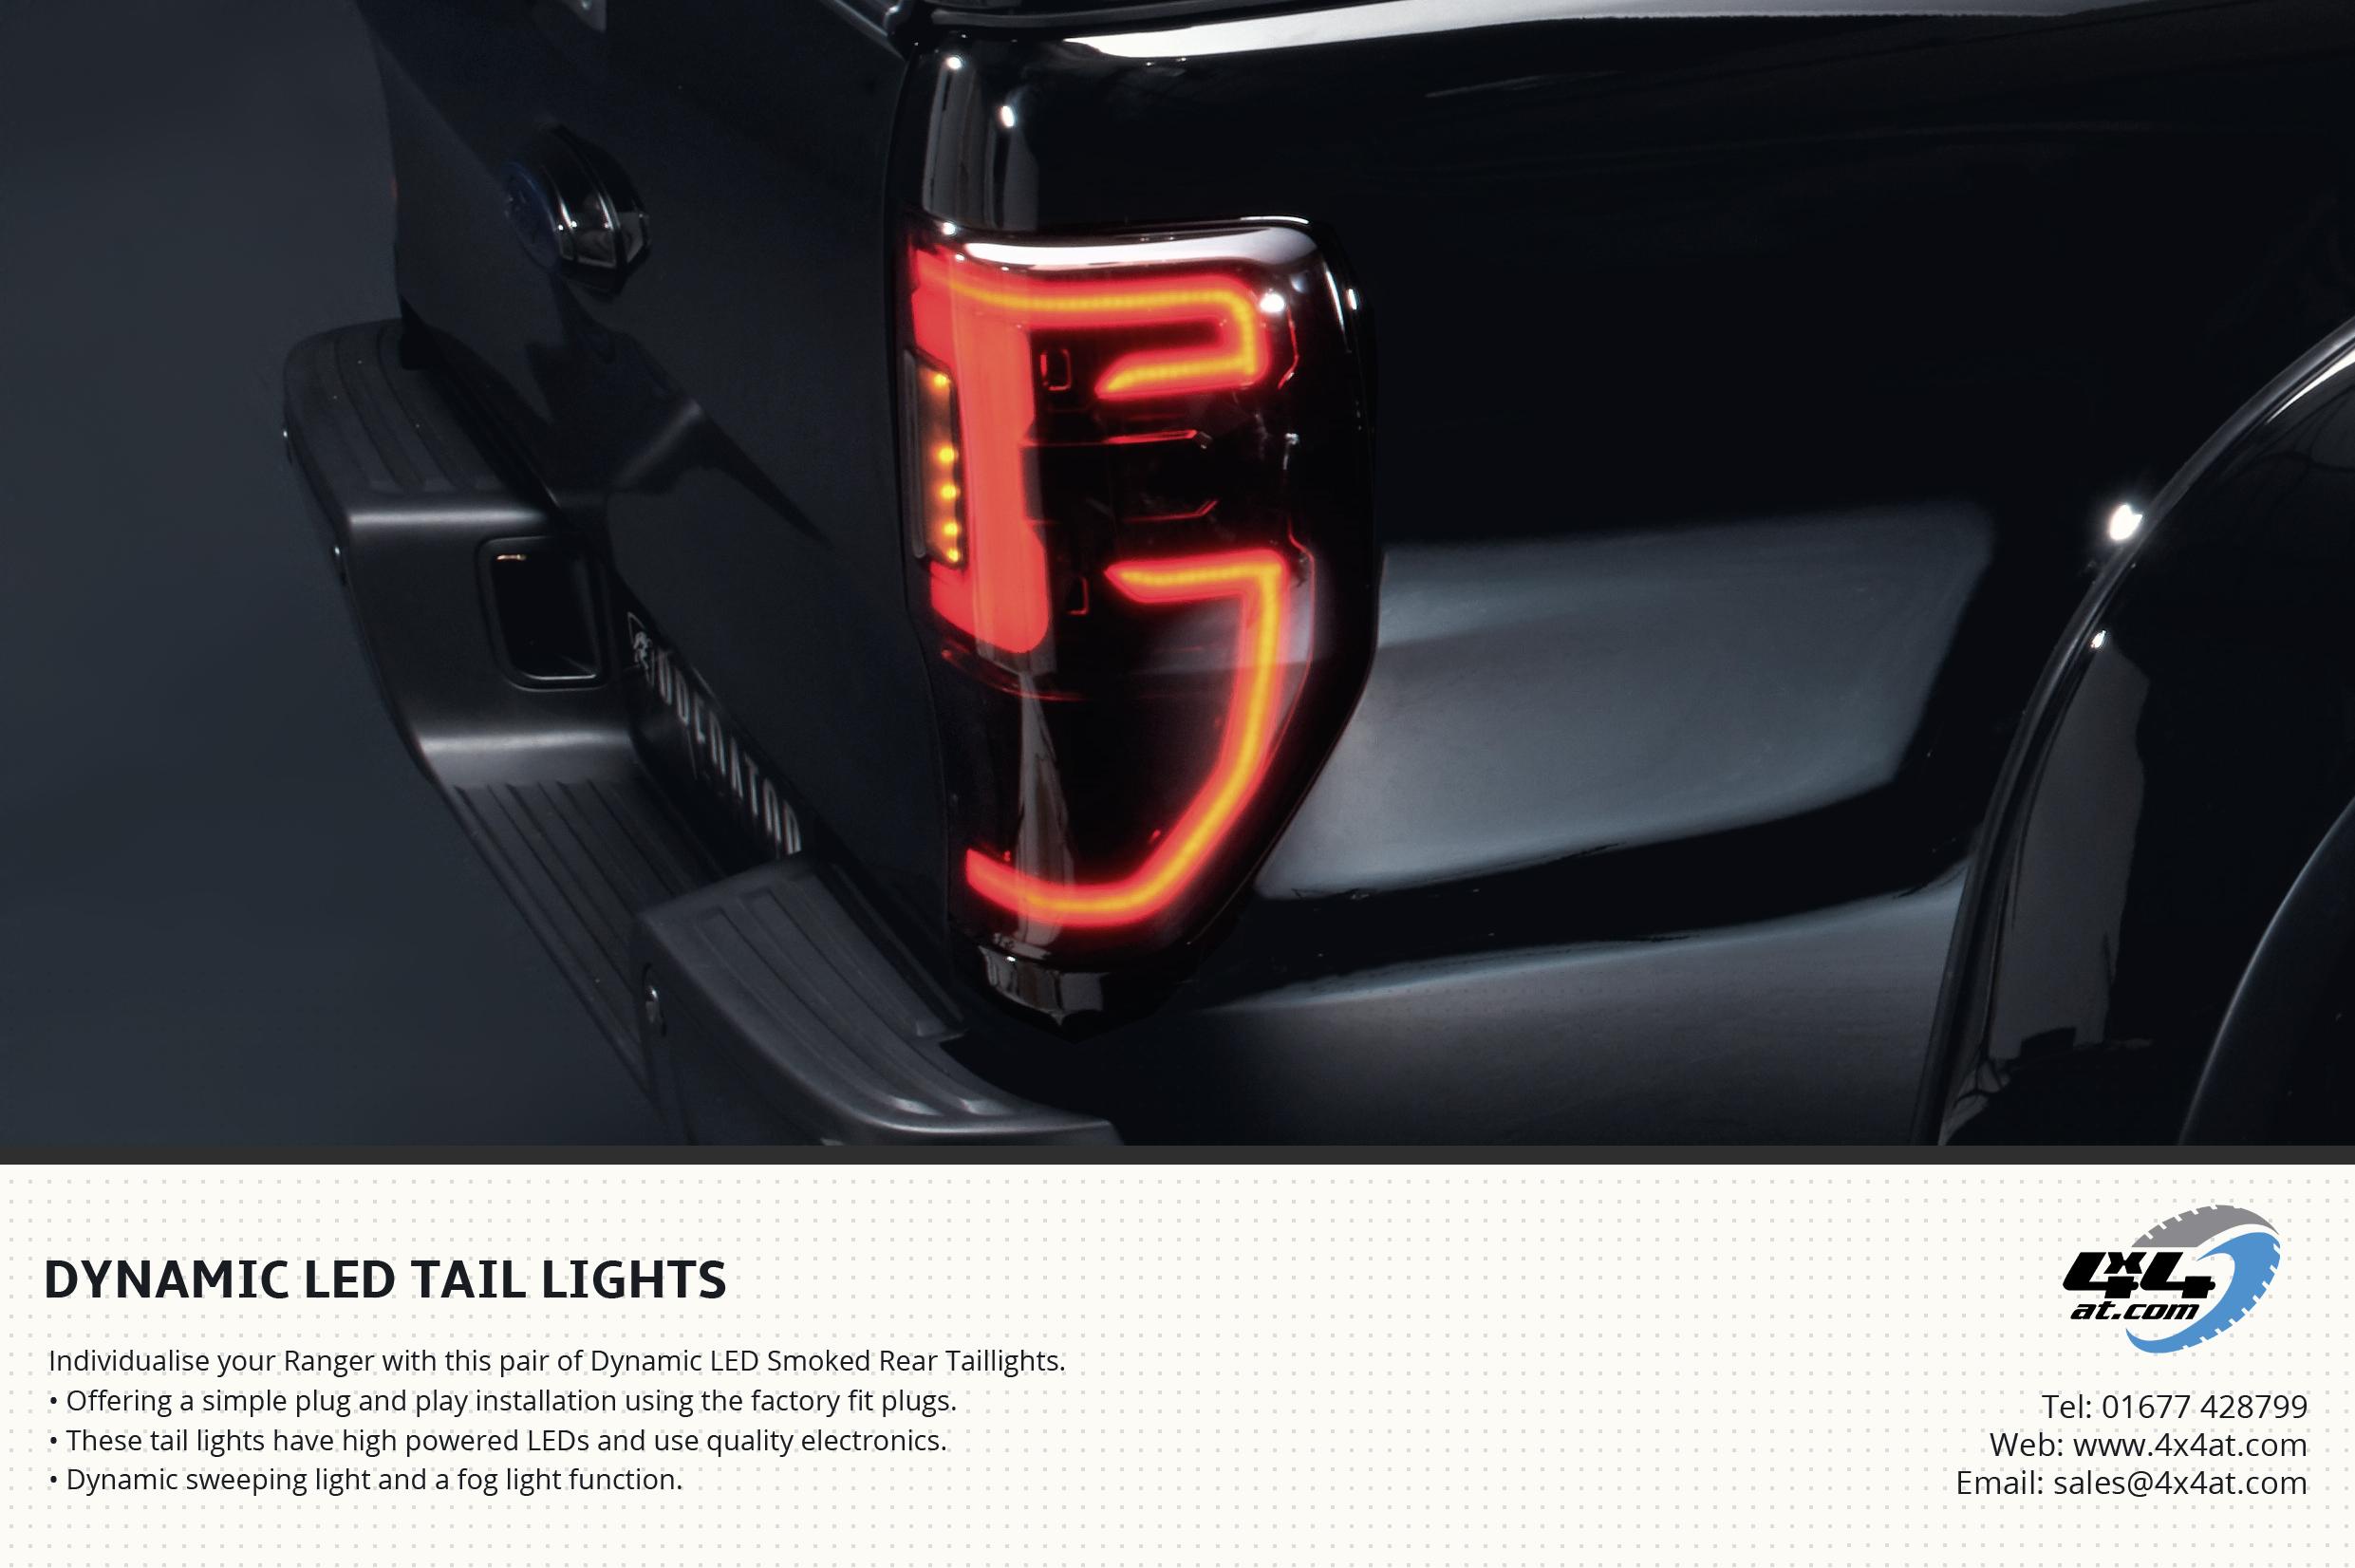 Dynamic Tail Lights Flyer for Ford Ranger